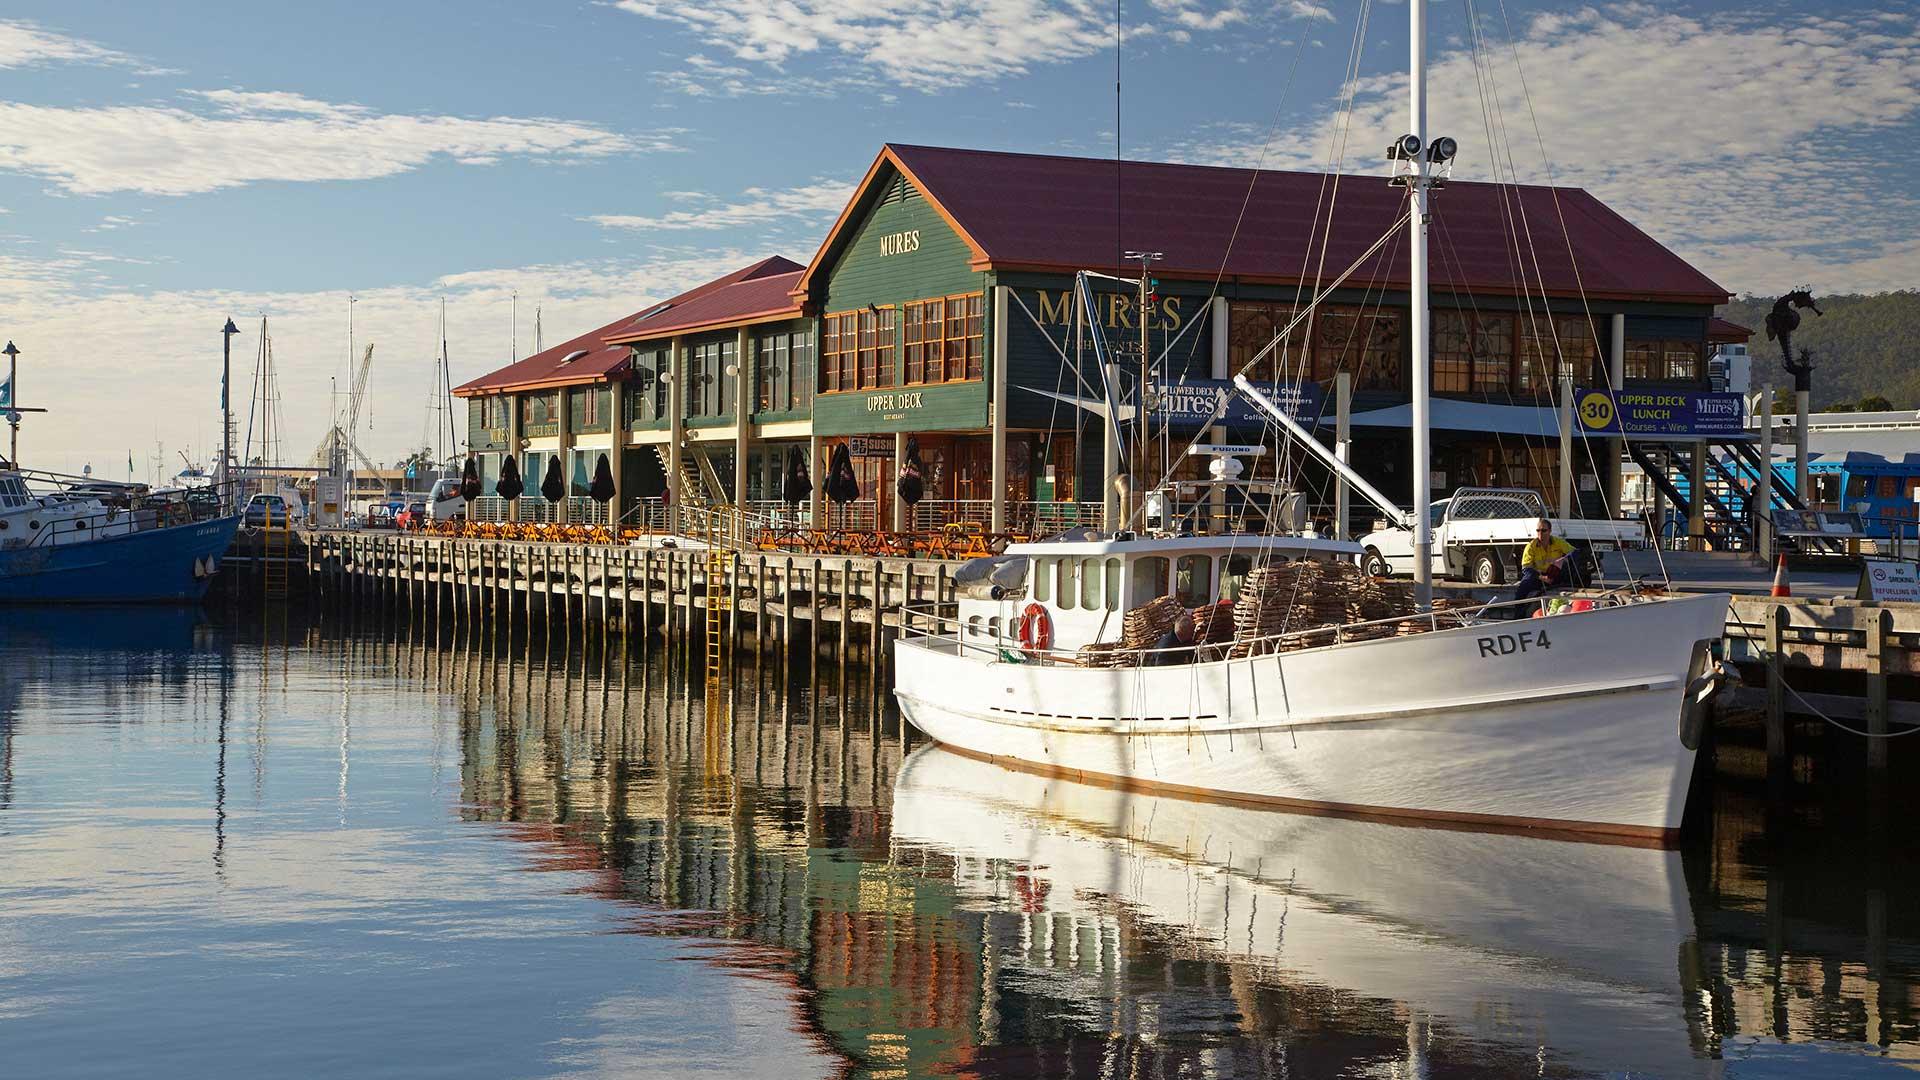 Fishing Boats and Mures Seafood Restaurant, Reflected in Victoria Dock, Hobart, Tasmania, Australia